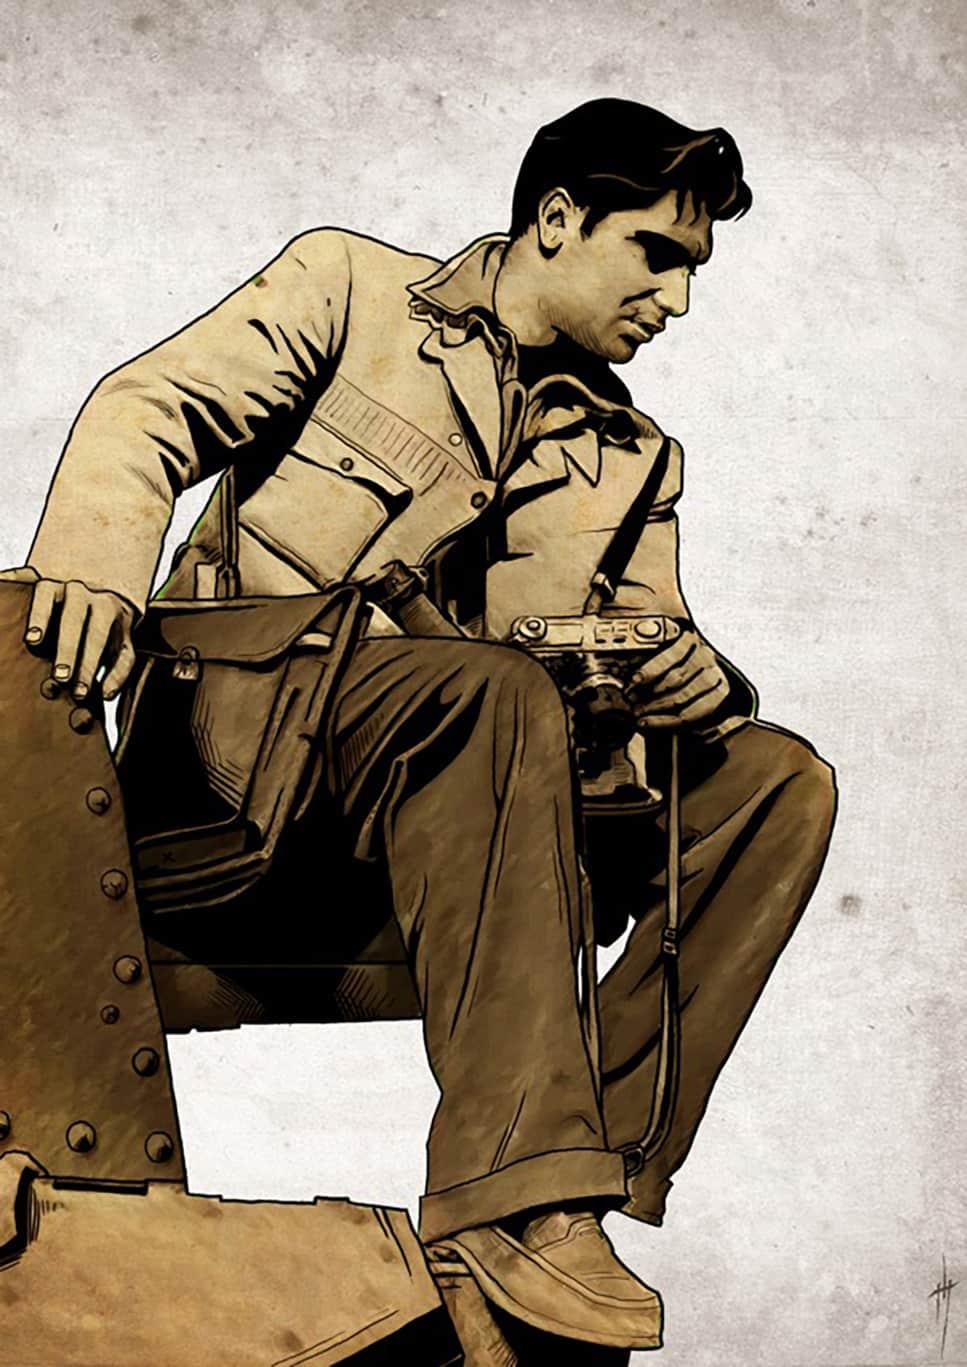 Robert Capa illustration